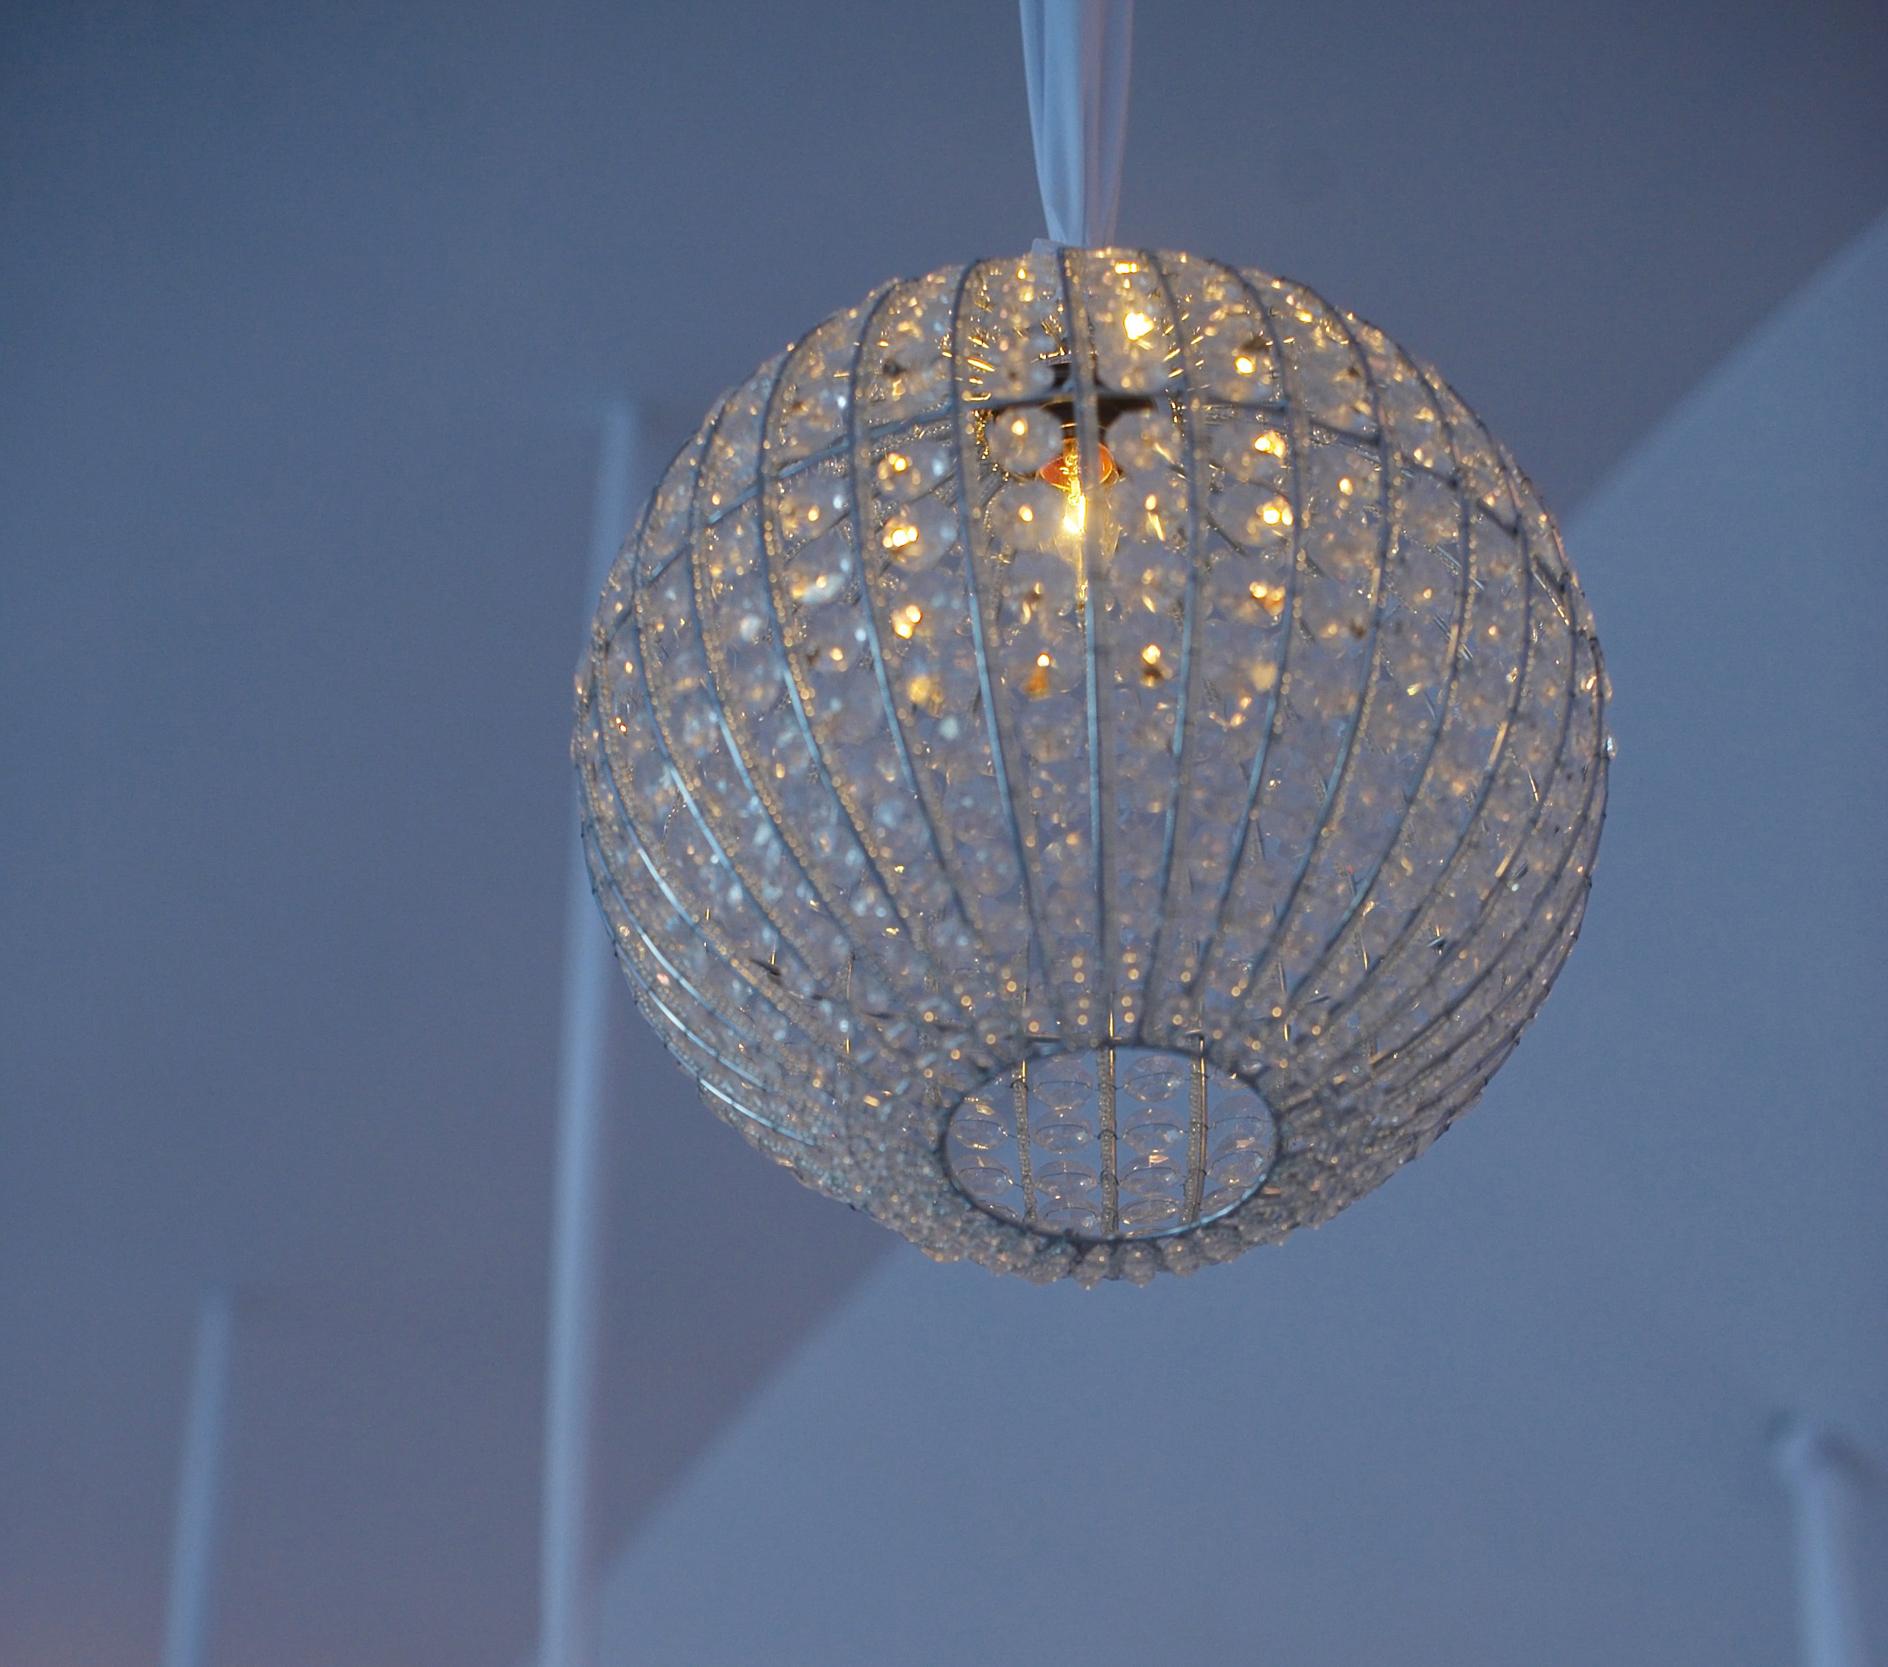 Lighting design 10 unique ways to light your reception inside crystal globe lighting fixture arubaitofo Choice Image